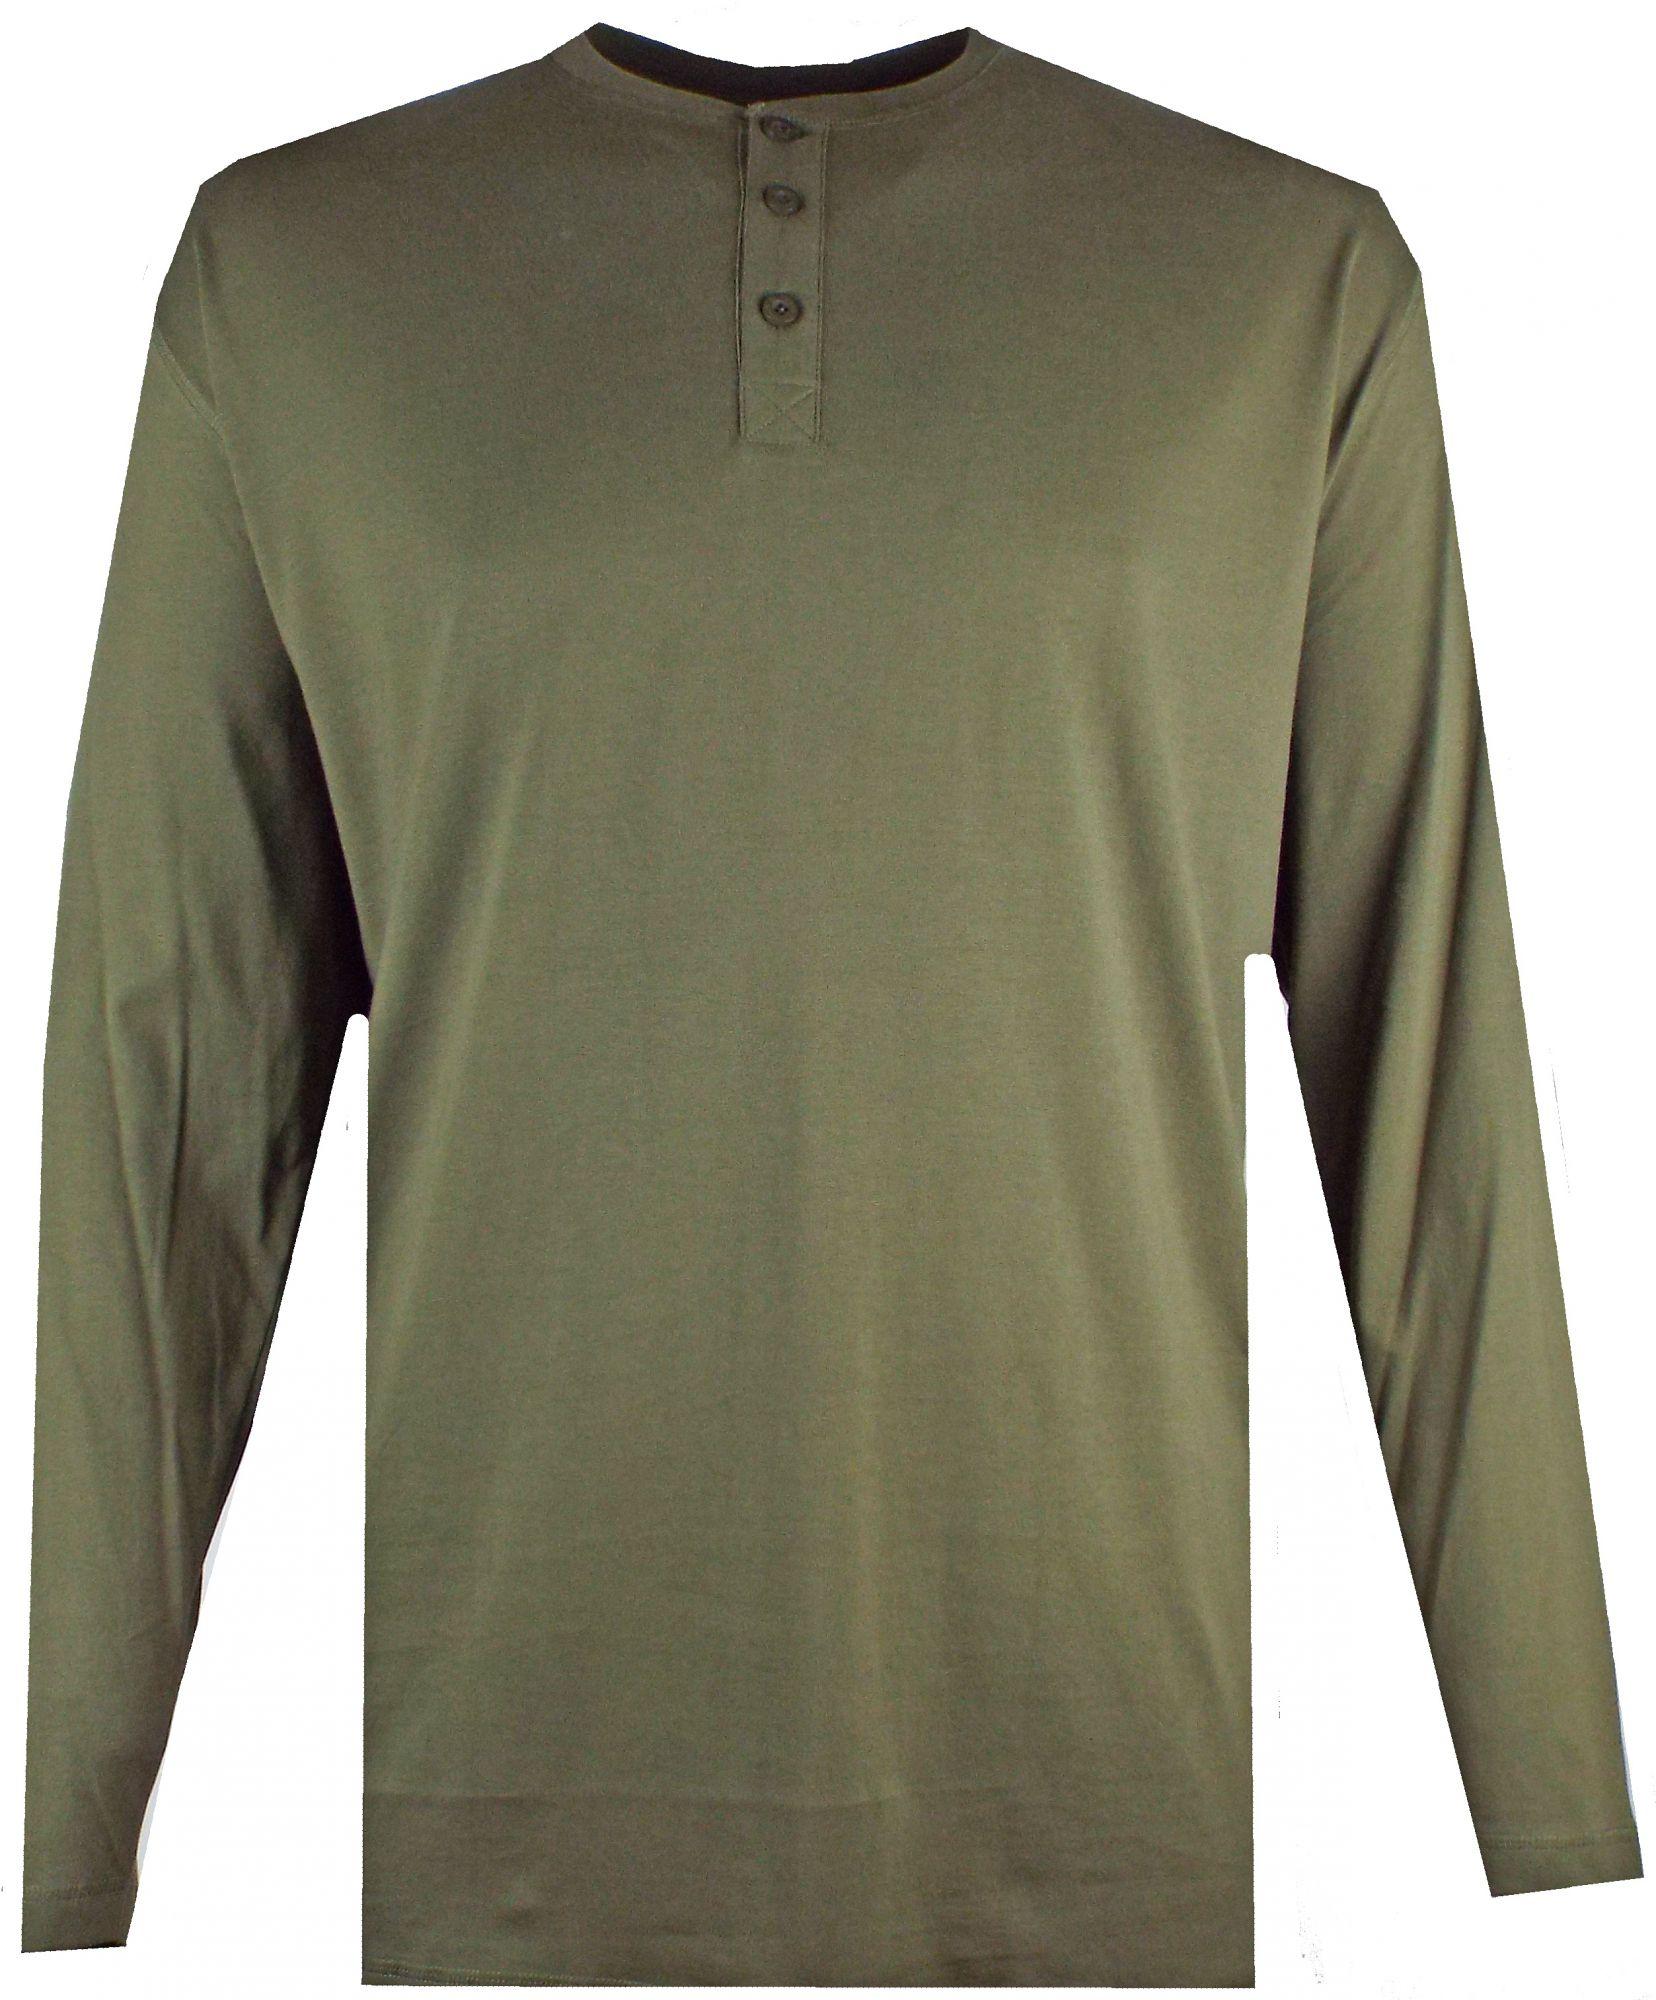 Tshirt Manches Longues Vert Espionage du 2XL au 8XL